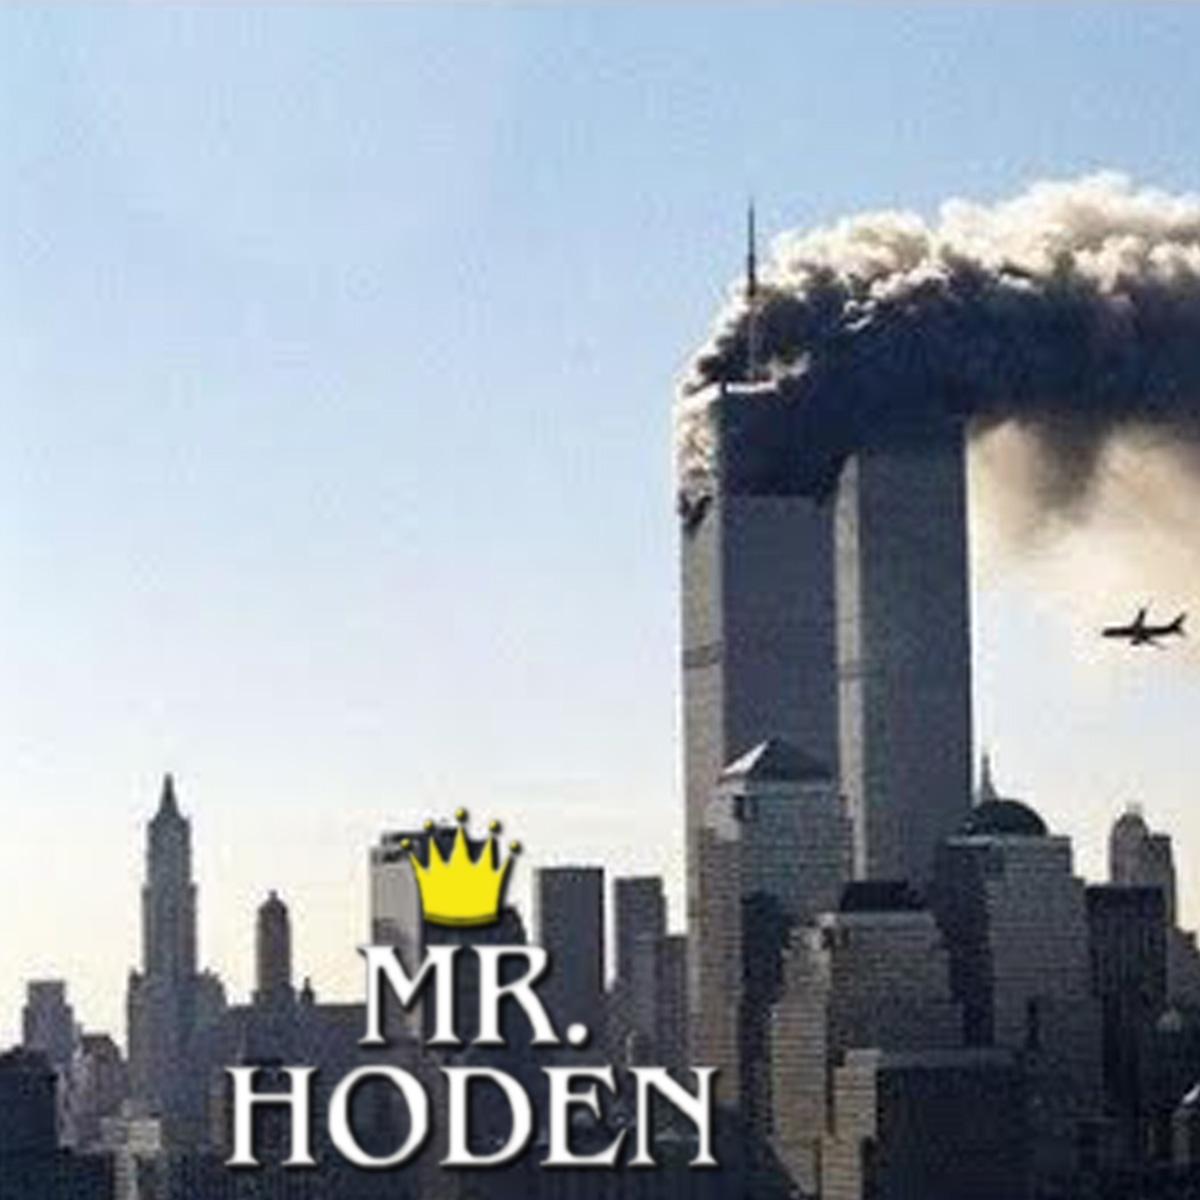 Upcoming: Mr. Hoden - Aggressive 9/11 Trap Beat 2019 [FREE BEAT]